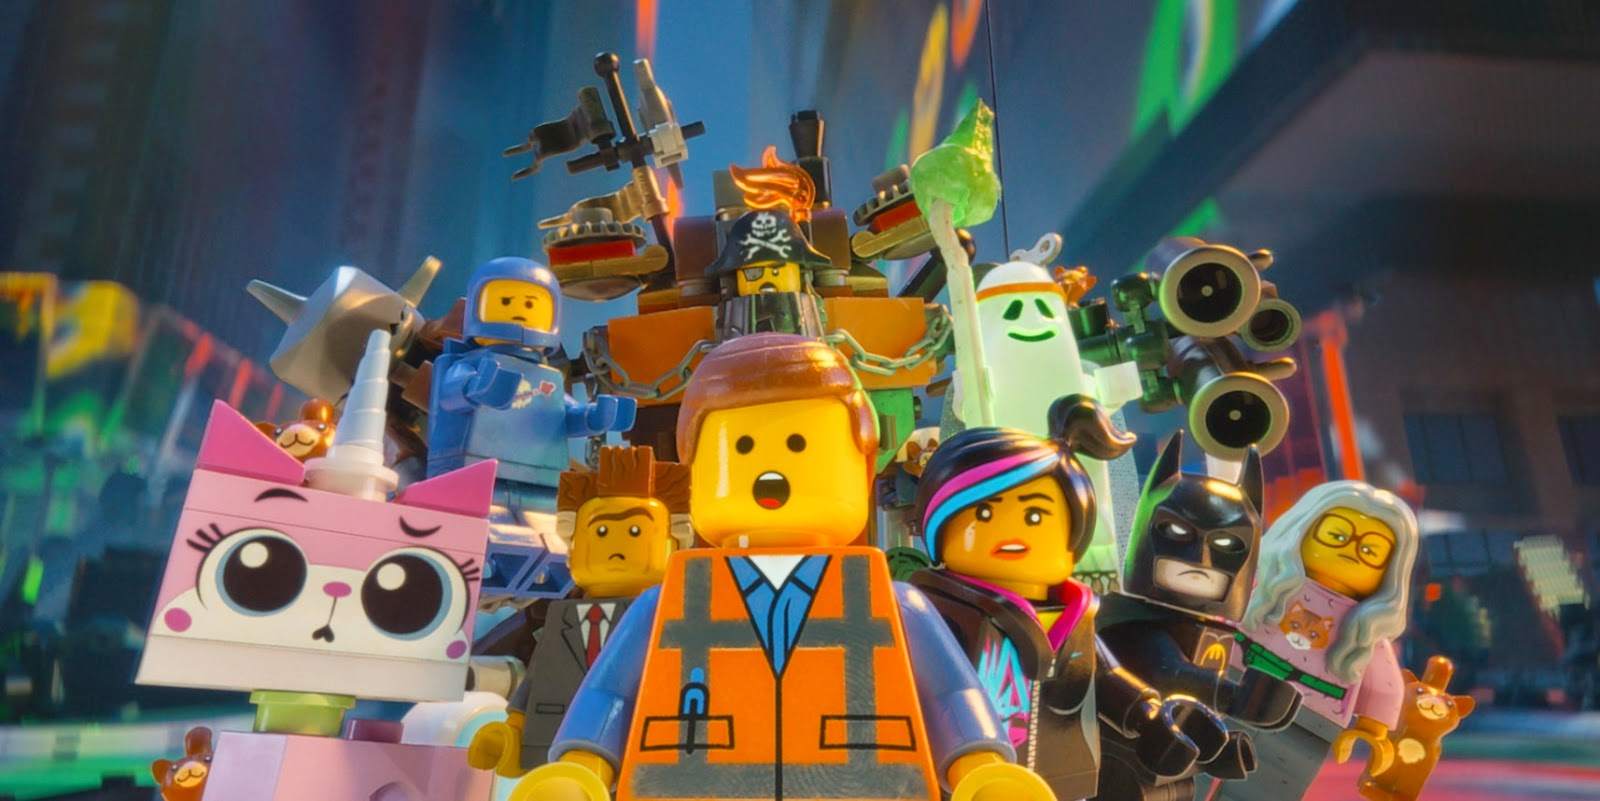 Warner Bros altera datas de Uma Aventura LEGO 2, Ninjago e LEGO Batman